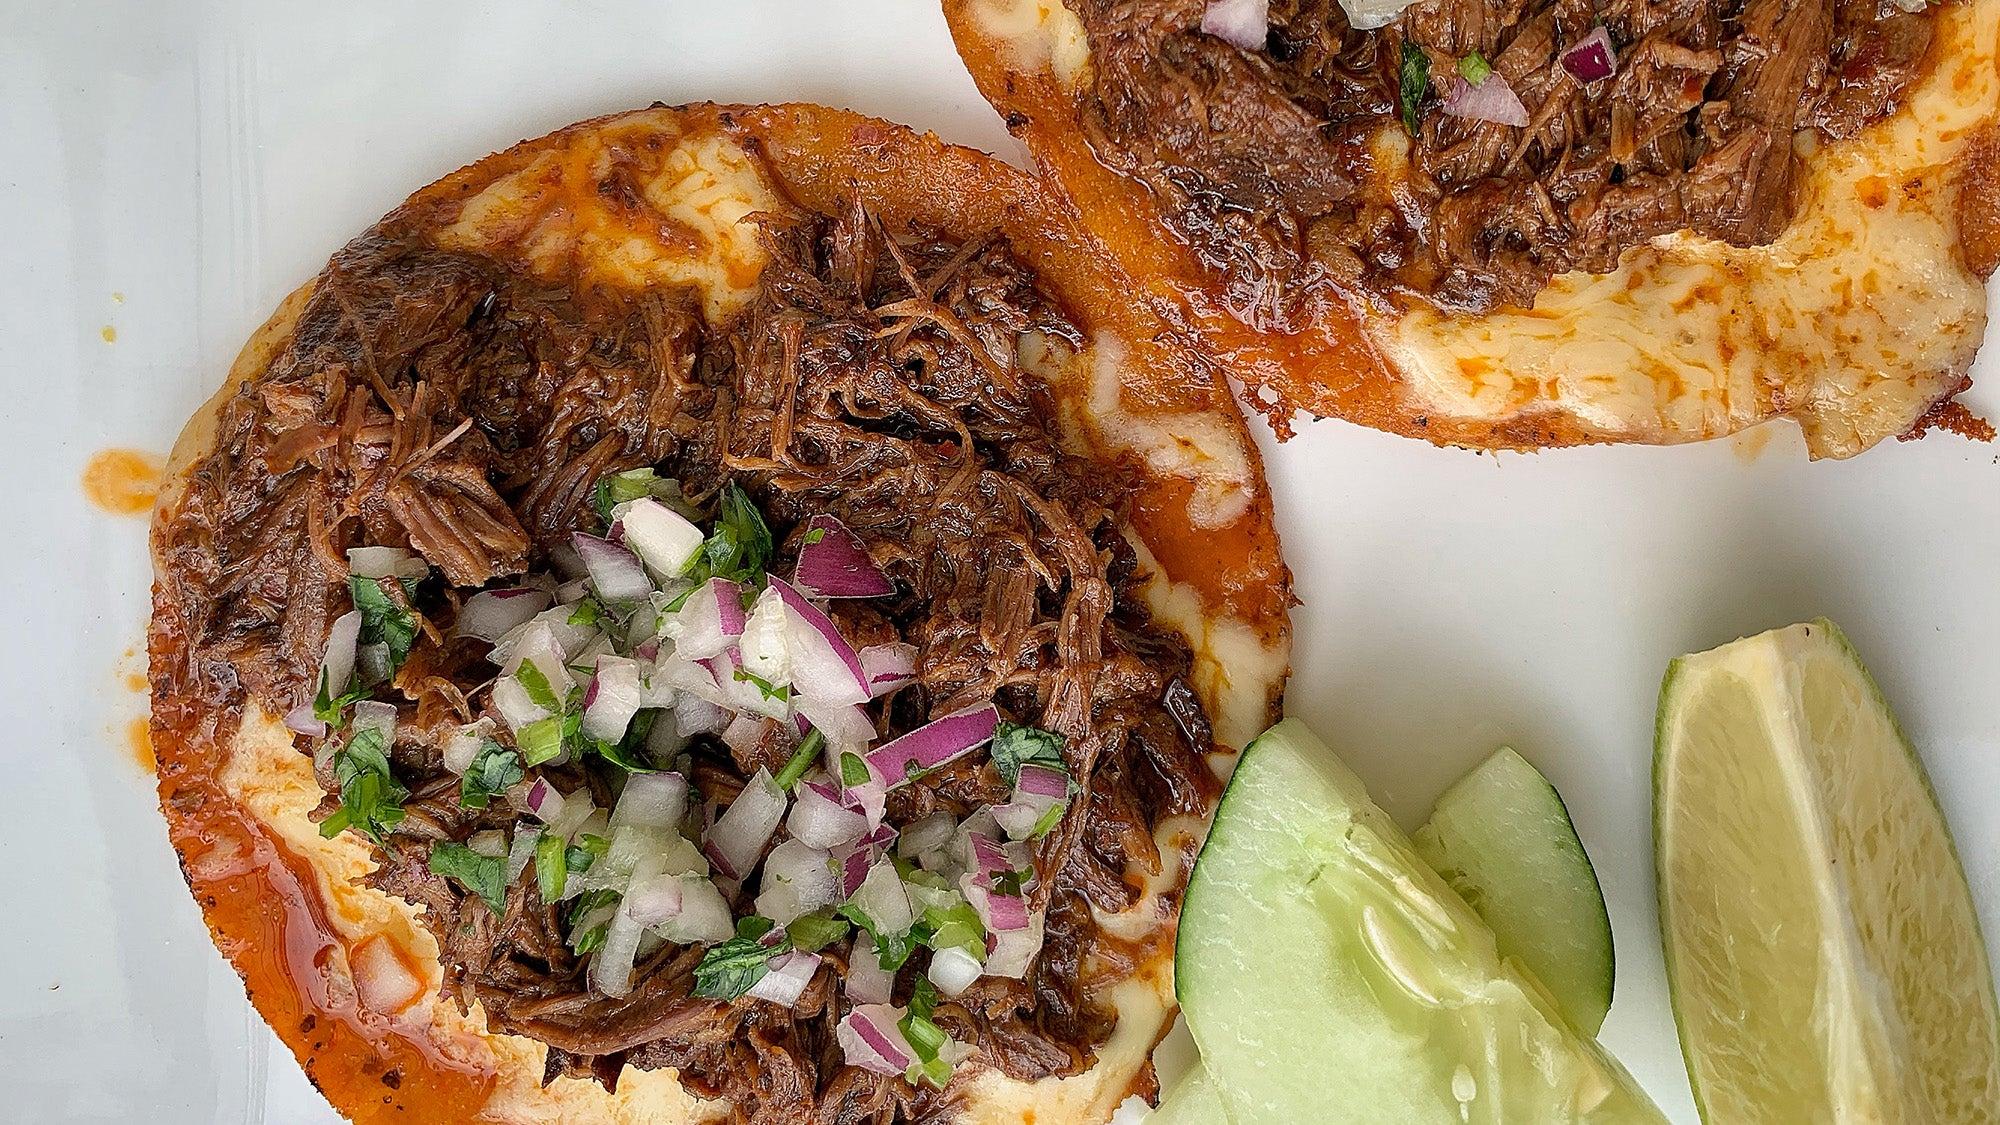 Birria tacos at Taqueria el Barrio